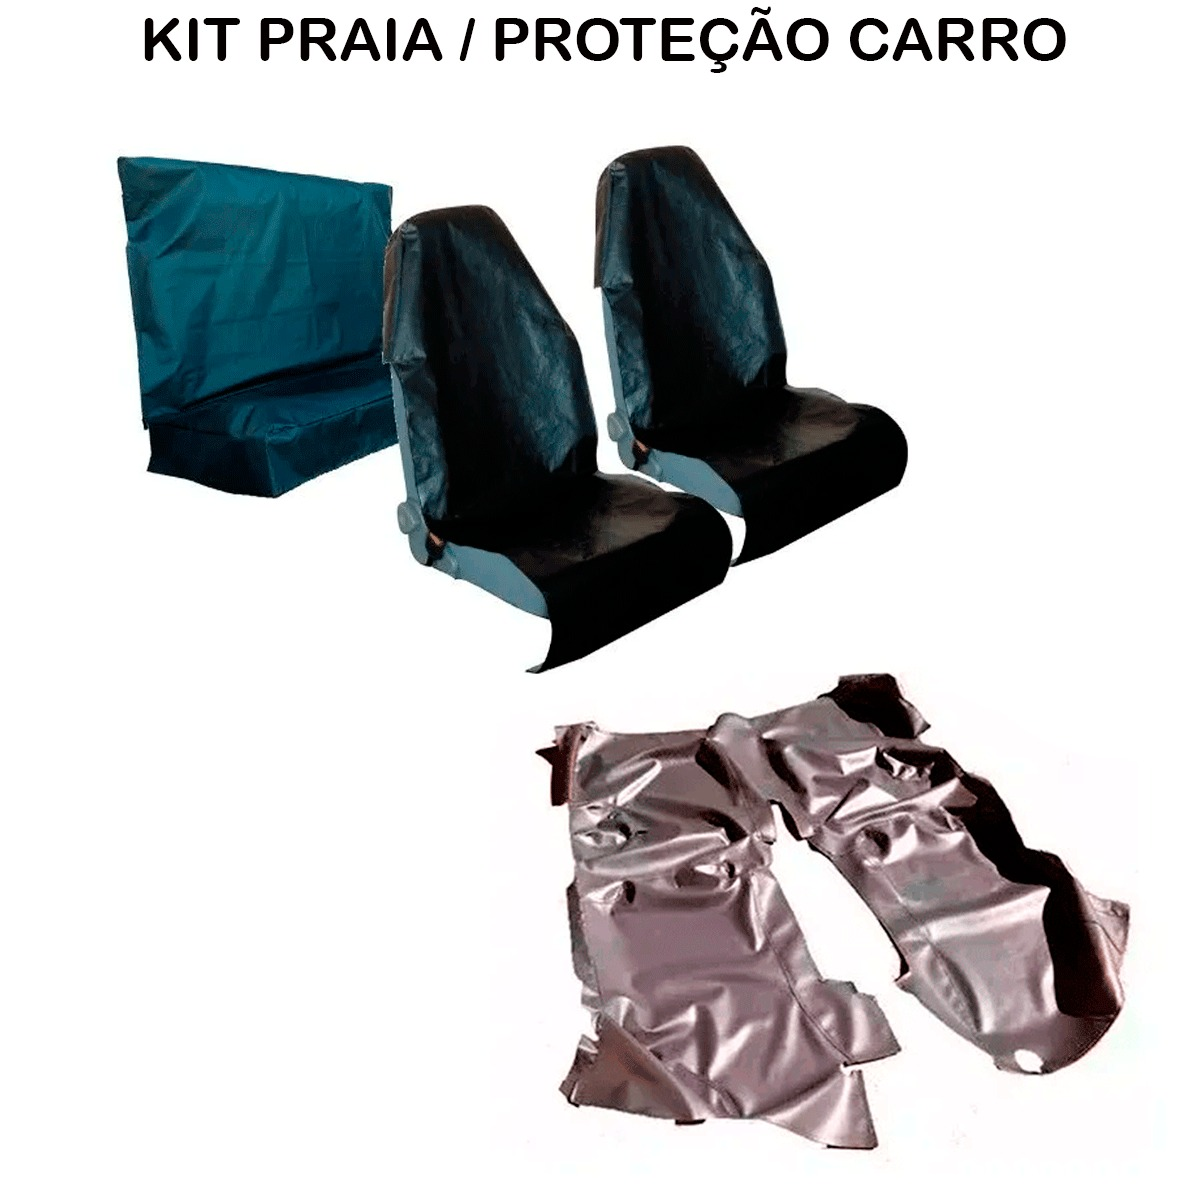 Tapete Em Vinil Chevrolet Blazer 95 a 2008 + Capa Banco Protecao Banco Areia Suor Academia